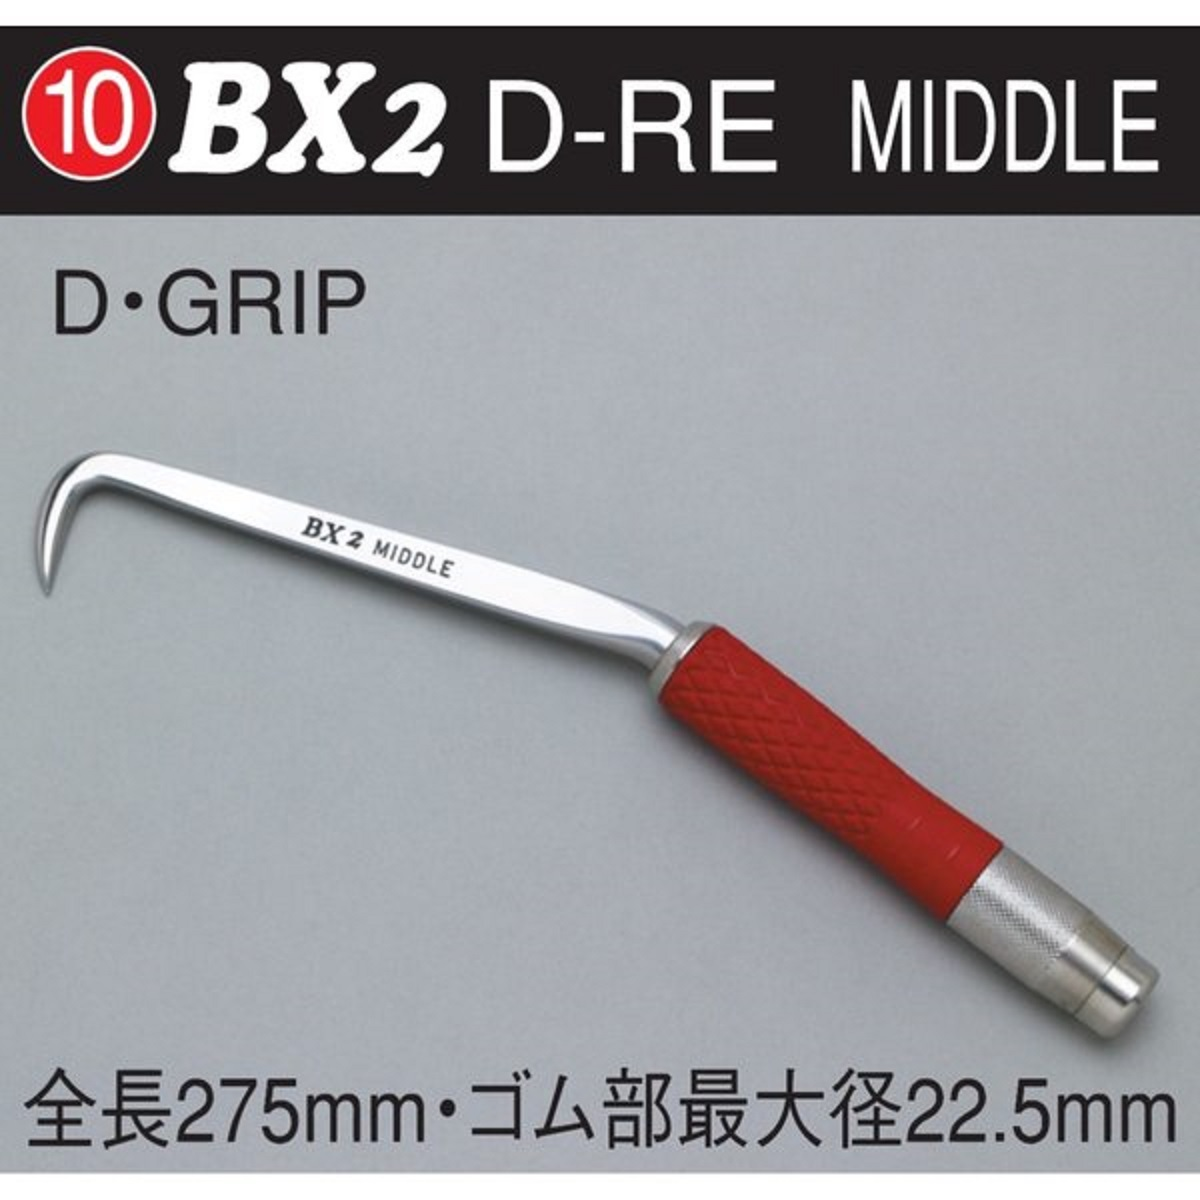 MIKI BX 2 D RE ハッカー ミドル D グリップ レッド 赤 鉄筋用作業工具 結束線 ブランド ミキ 三貴